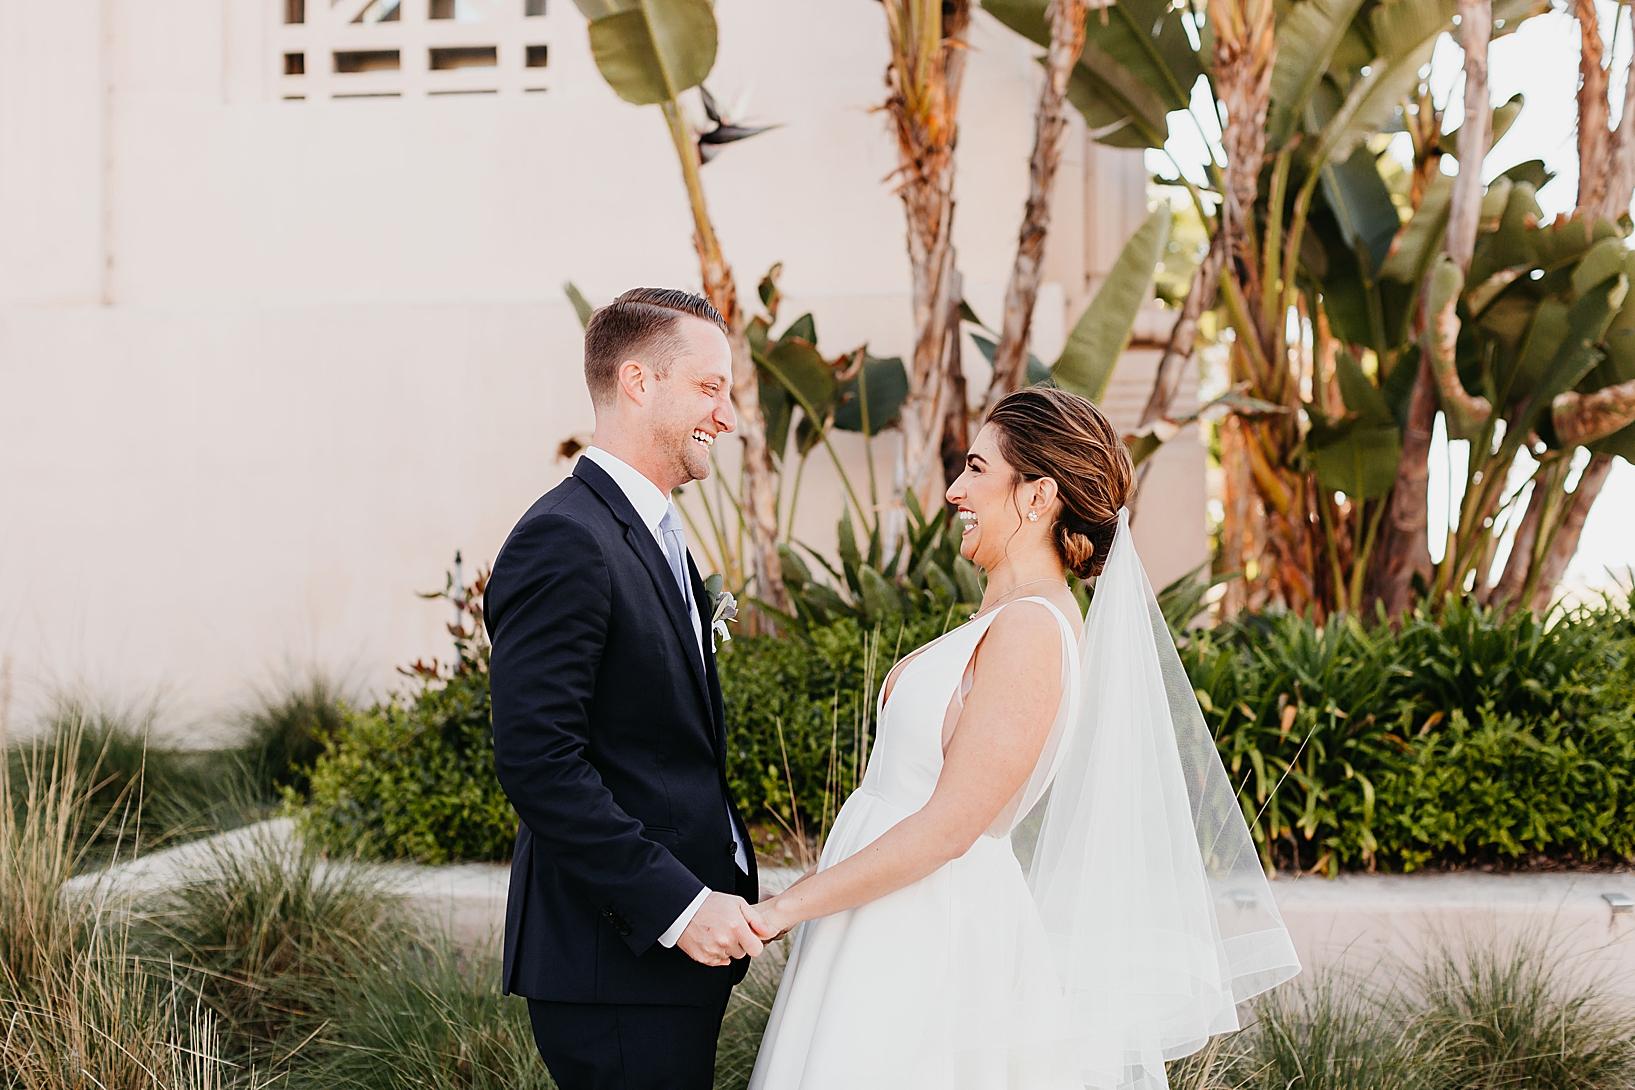 Herb-and-Wood-Wedding-16.jpg